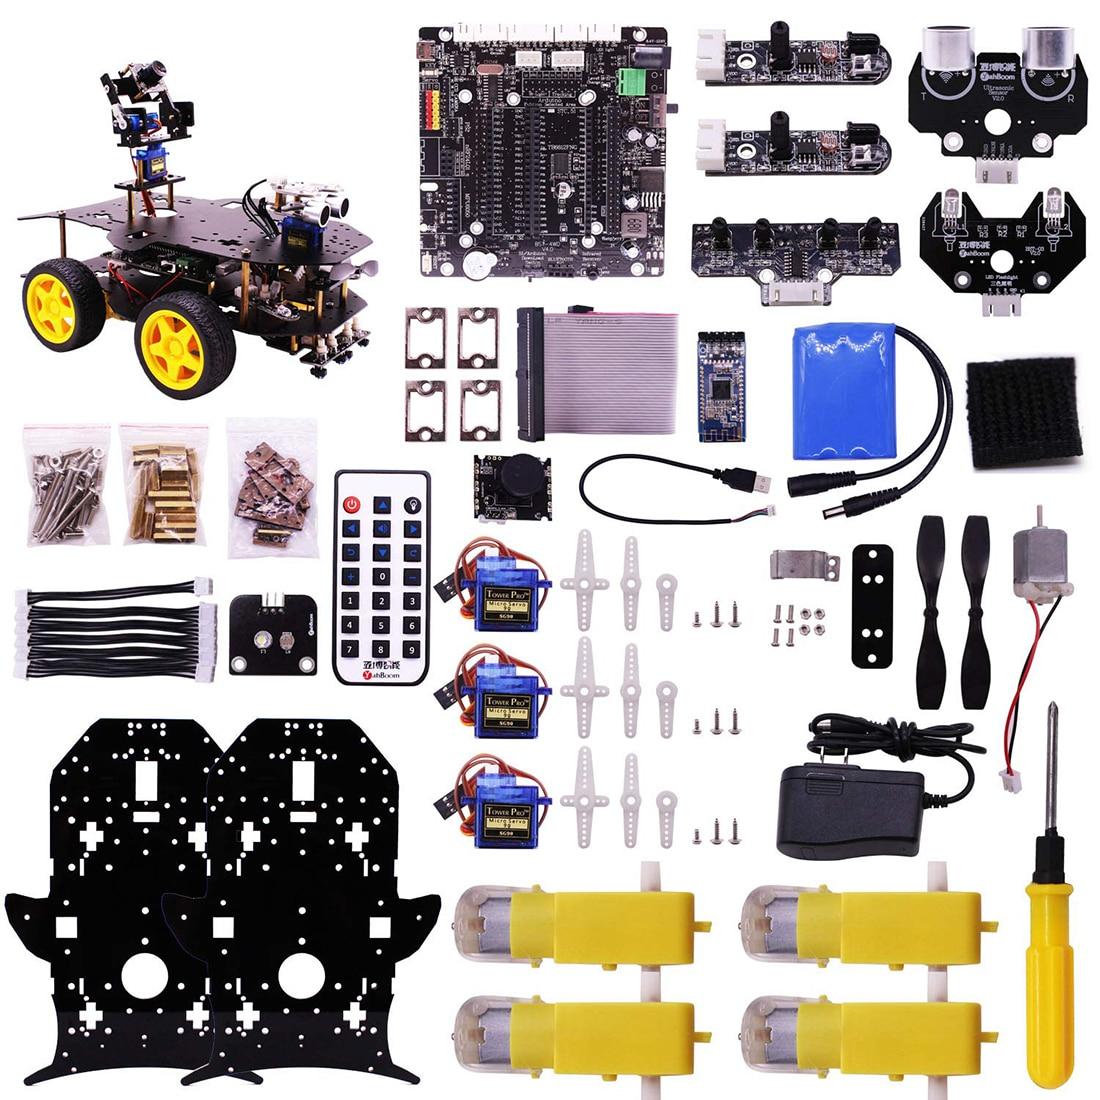 Ultimate Starter Kit voor Raspberry Pi 3 B + HD Camera Programmeerbare Smart Robot Car Kit met 4WD Elektronica Onderwijs-in Professioneel Speelgoed van Speelgoed & Hobbies op  Groep 3